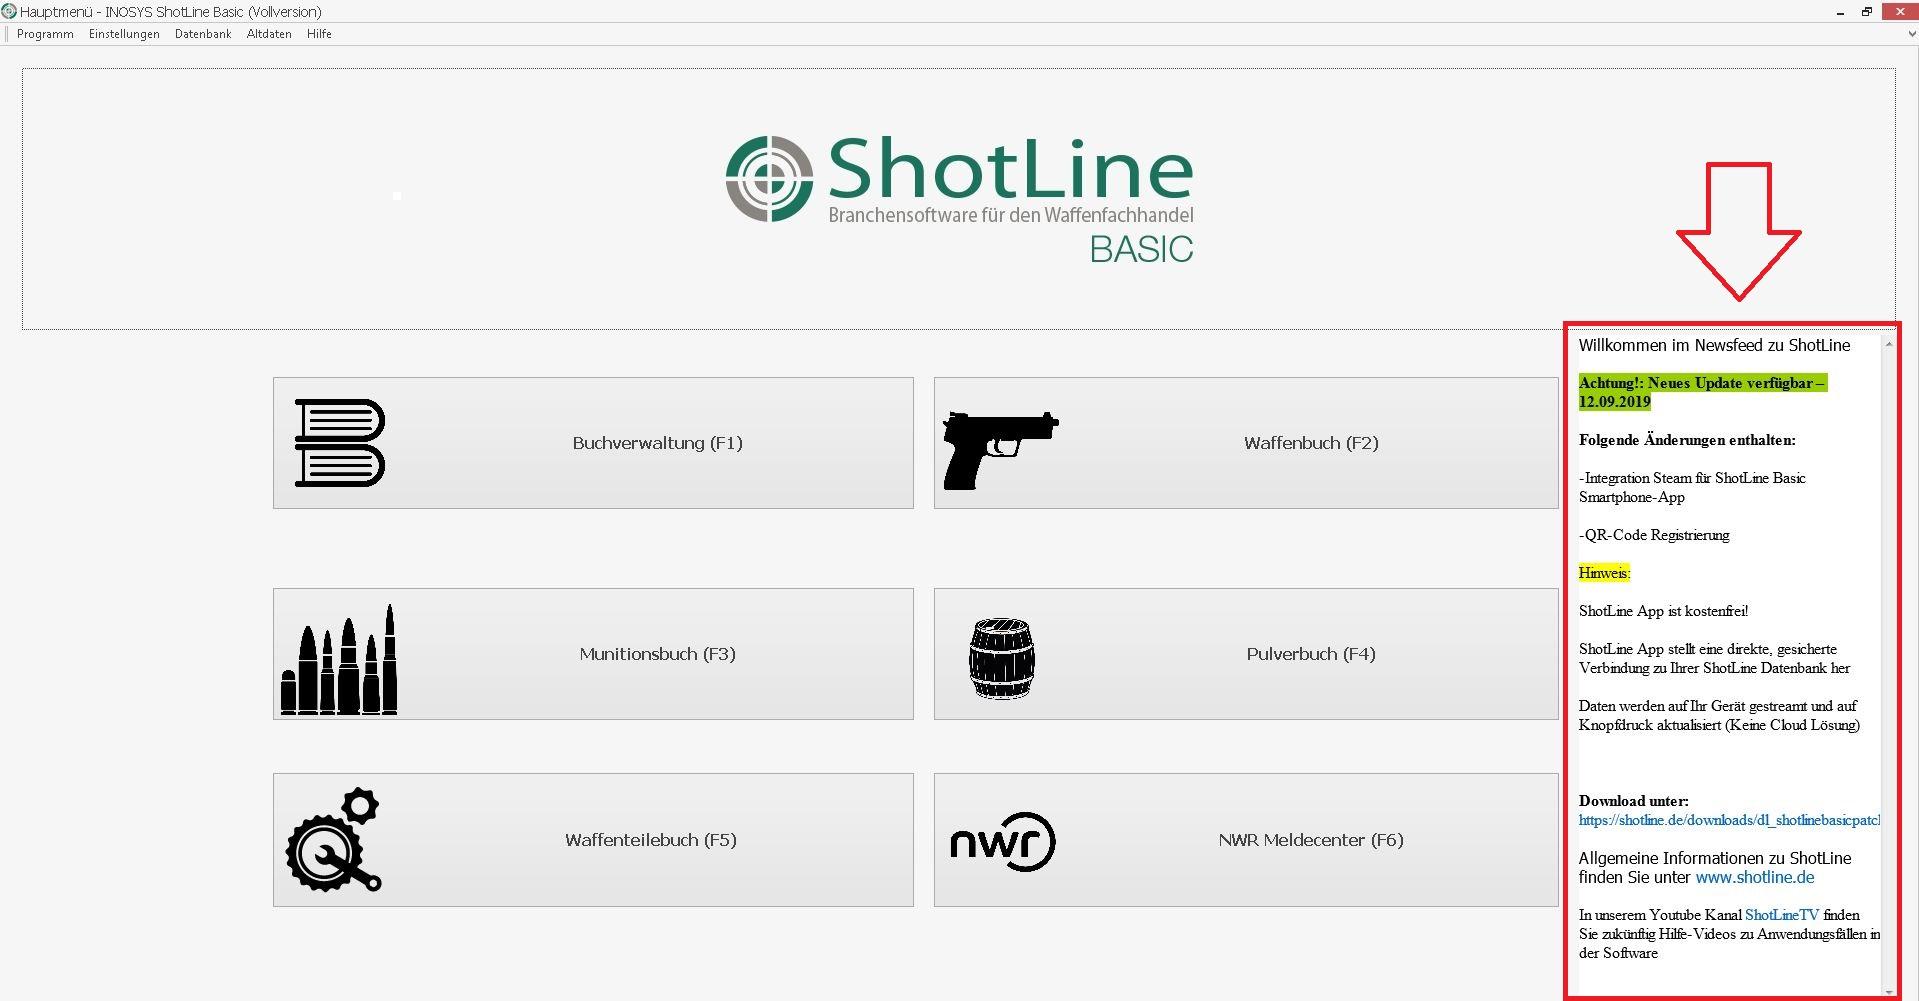 ShotLine Newsfeed